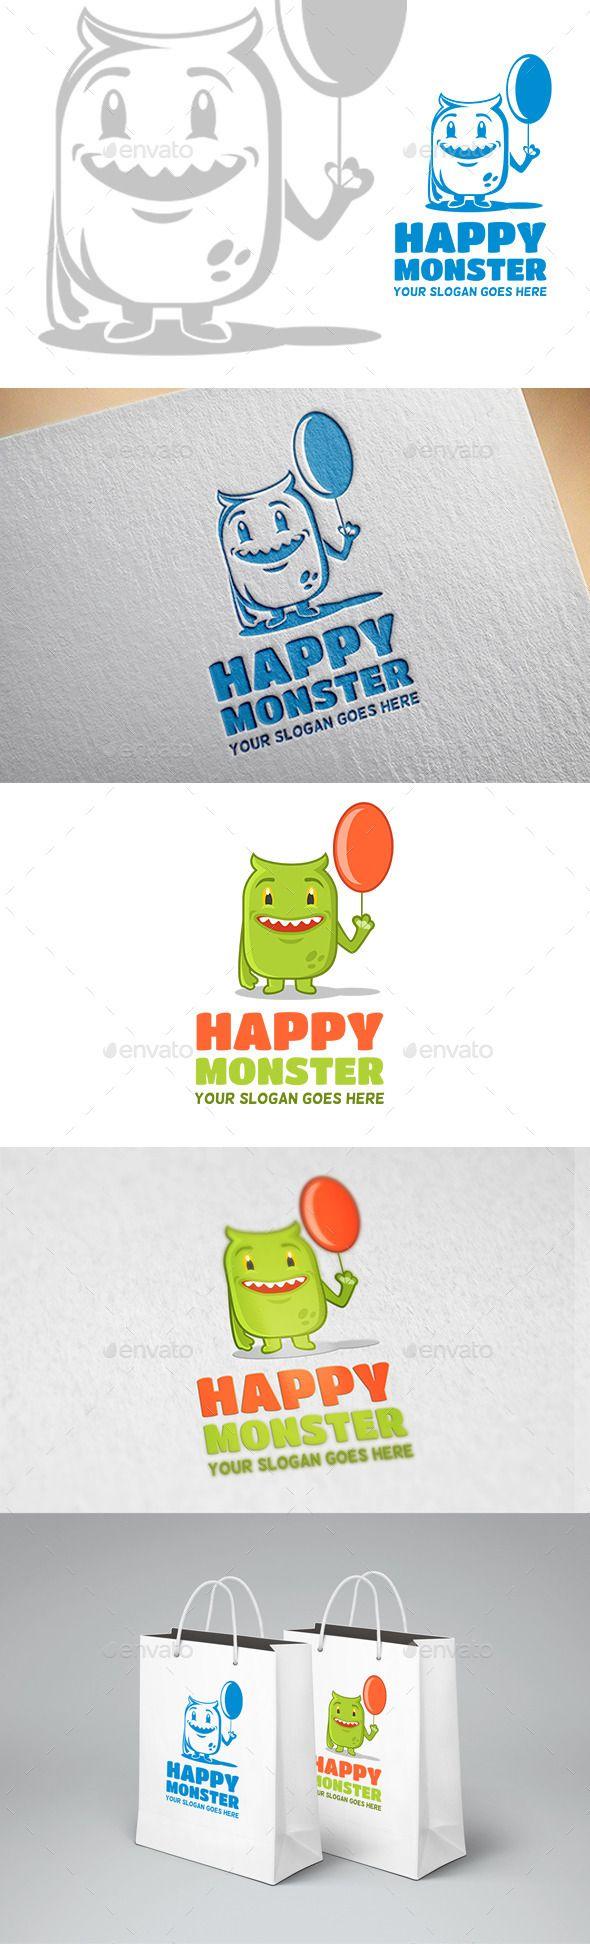 Happy Monster Logo — Vector EPS #monsters #playful • Download here → https://graphicriver.net/item/happy-monster-logo/11955664?ref=pxcr